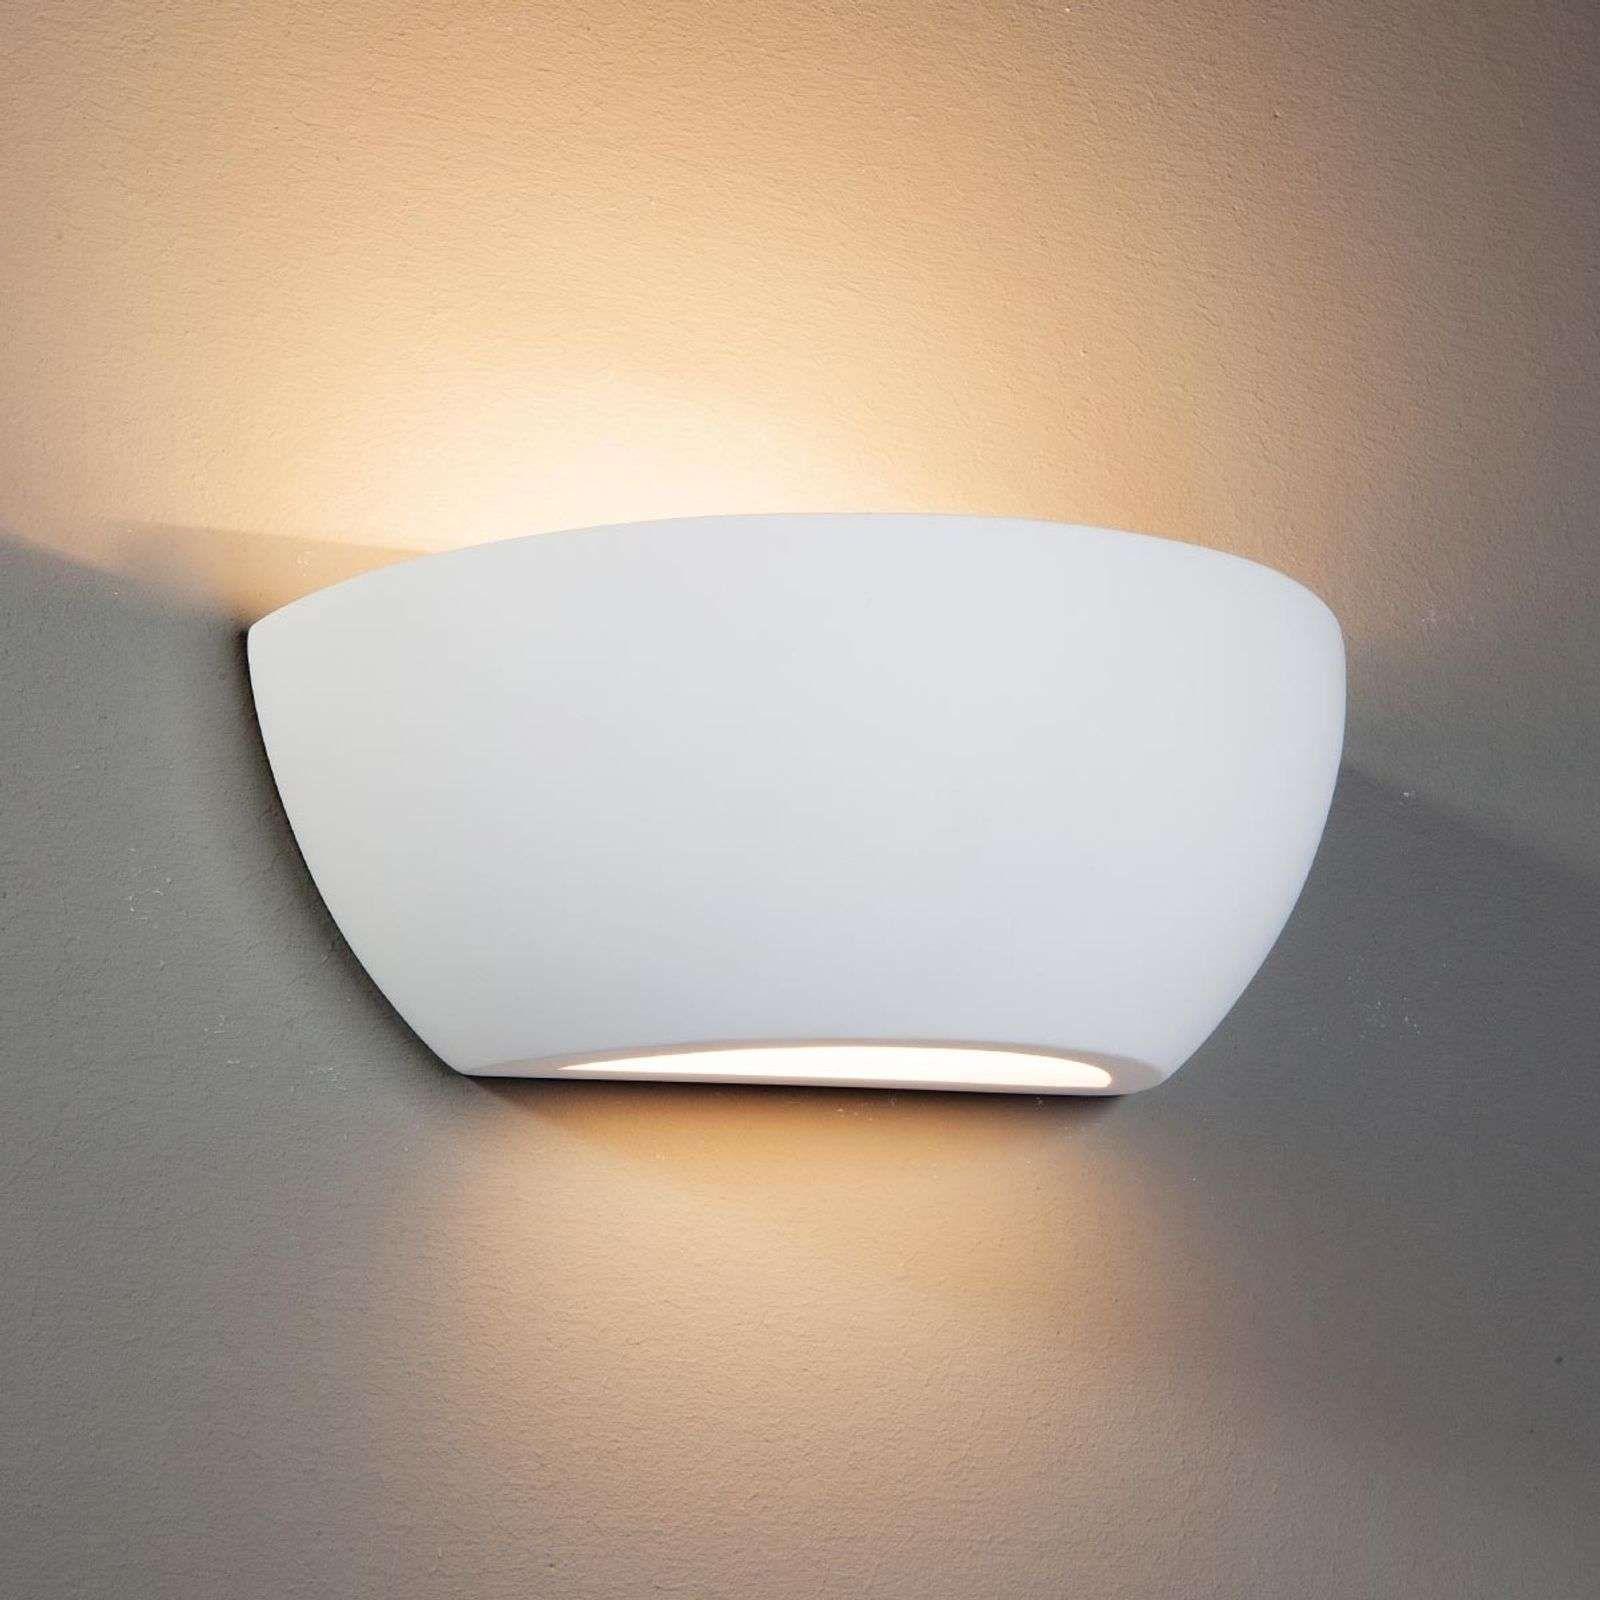 Elegante Gips Wandlamp Felia Wit Van Lindby Wandlamp Lampen En Verlichting